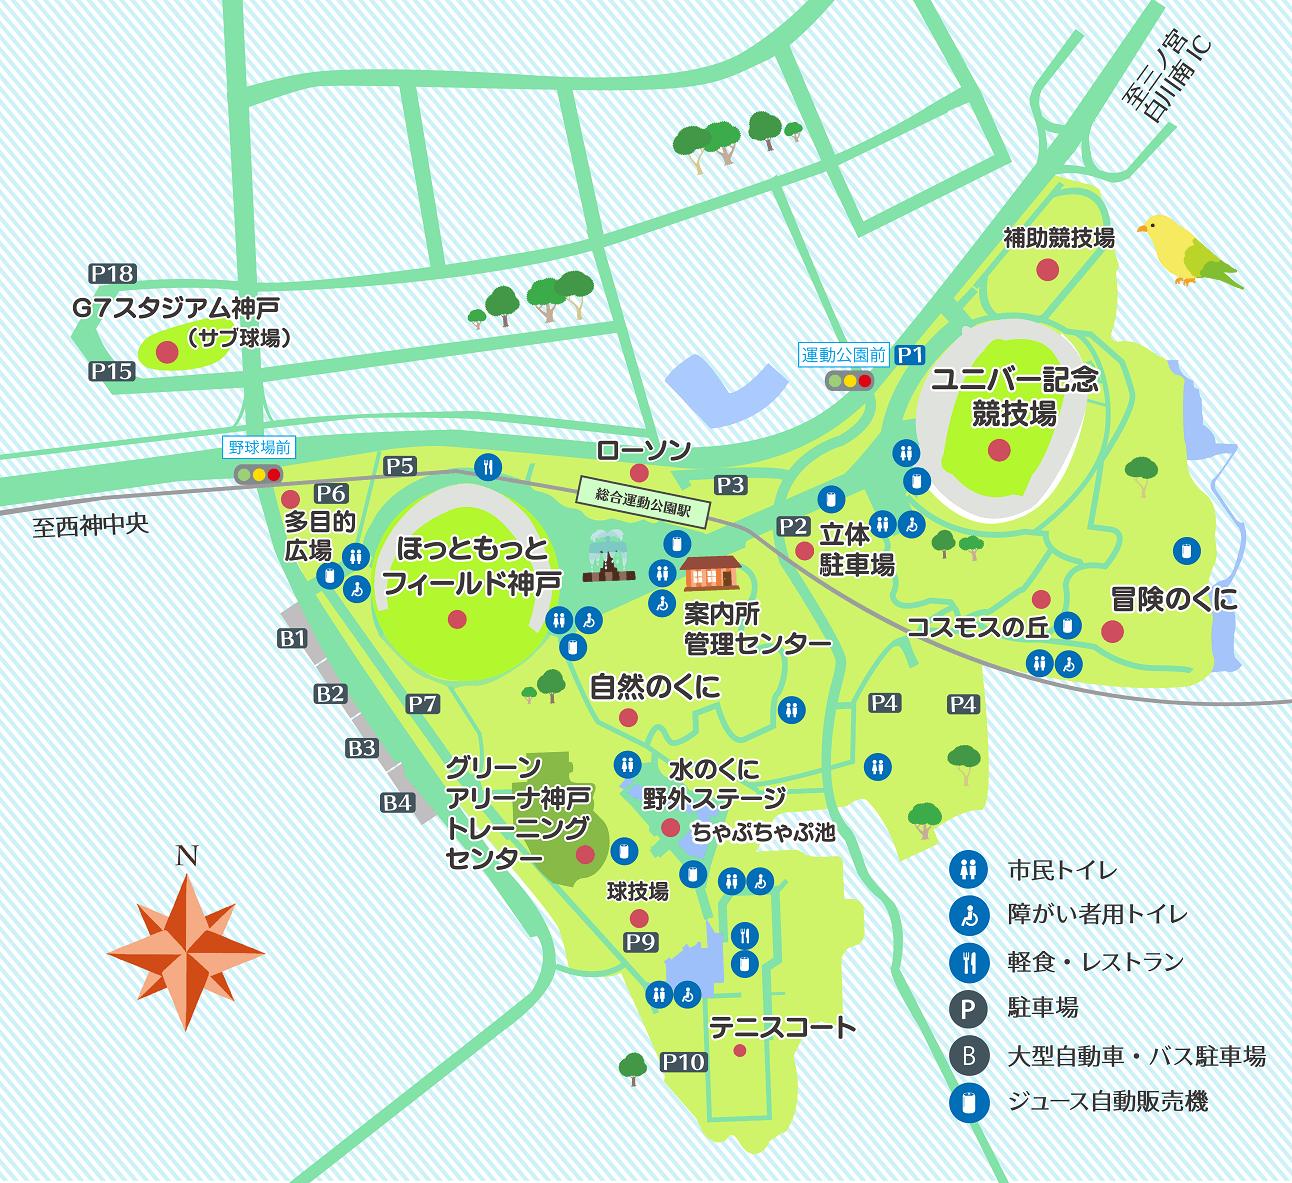 神戸総合運動公園マップ | 神戸...